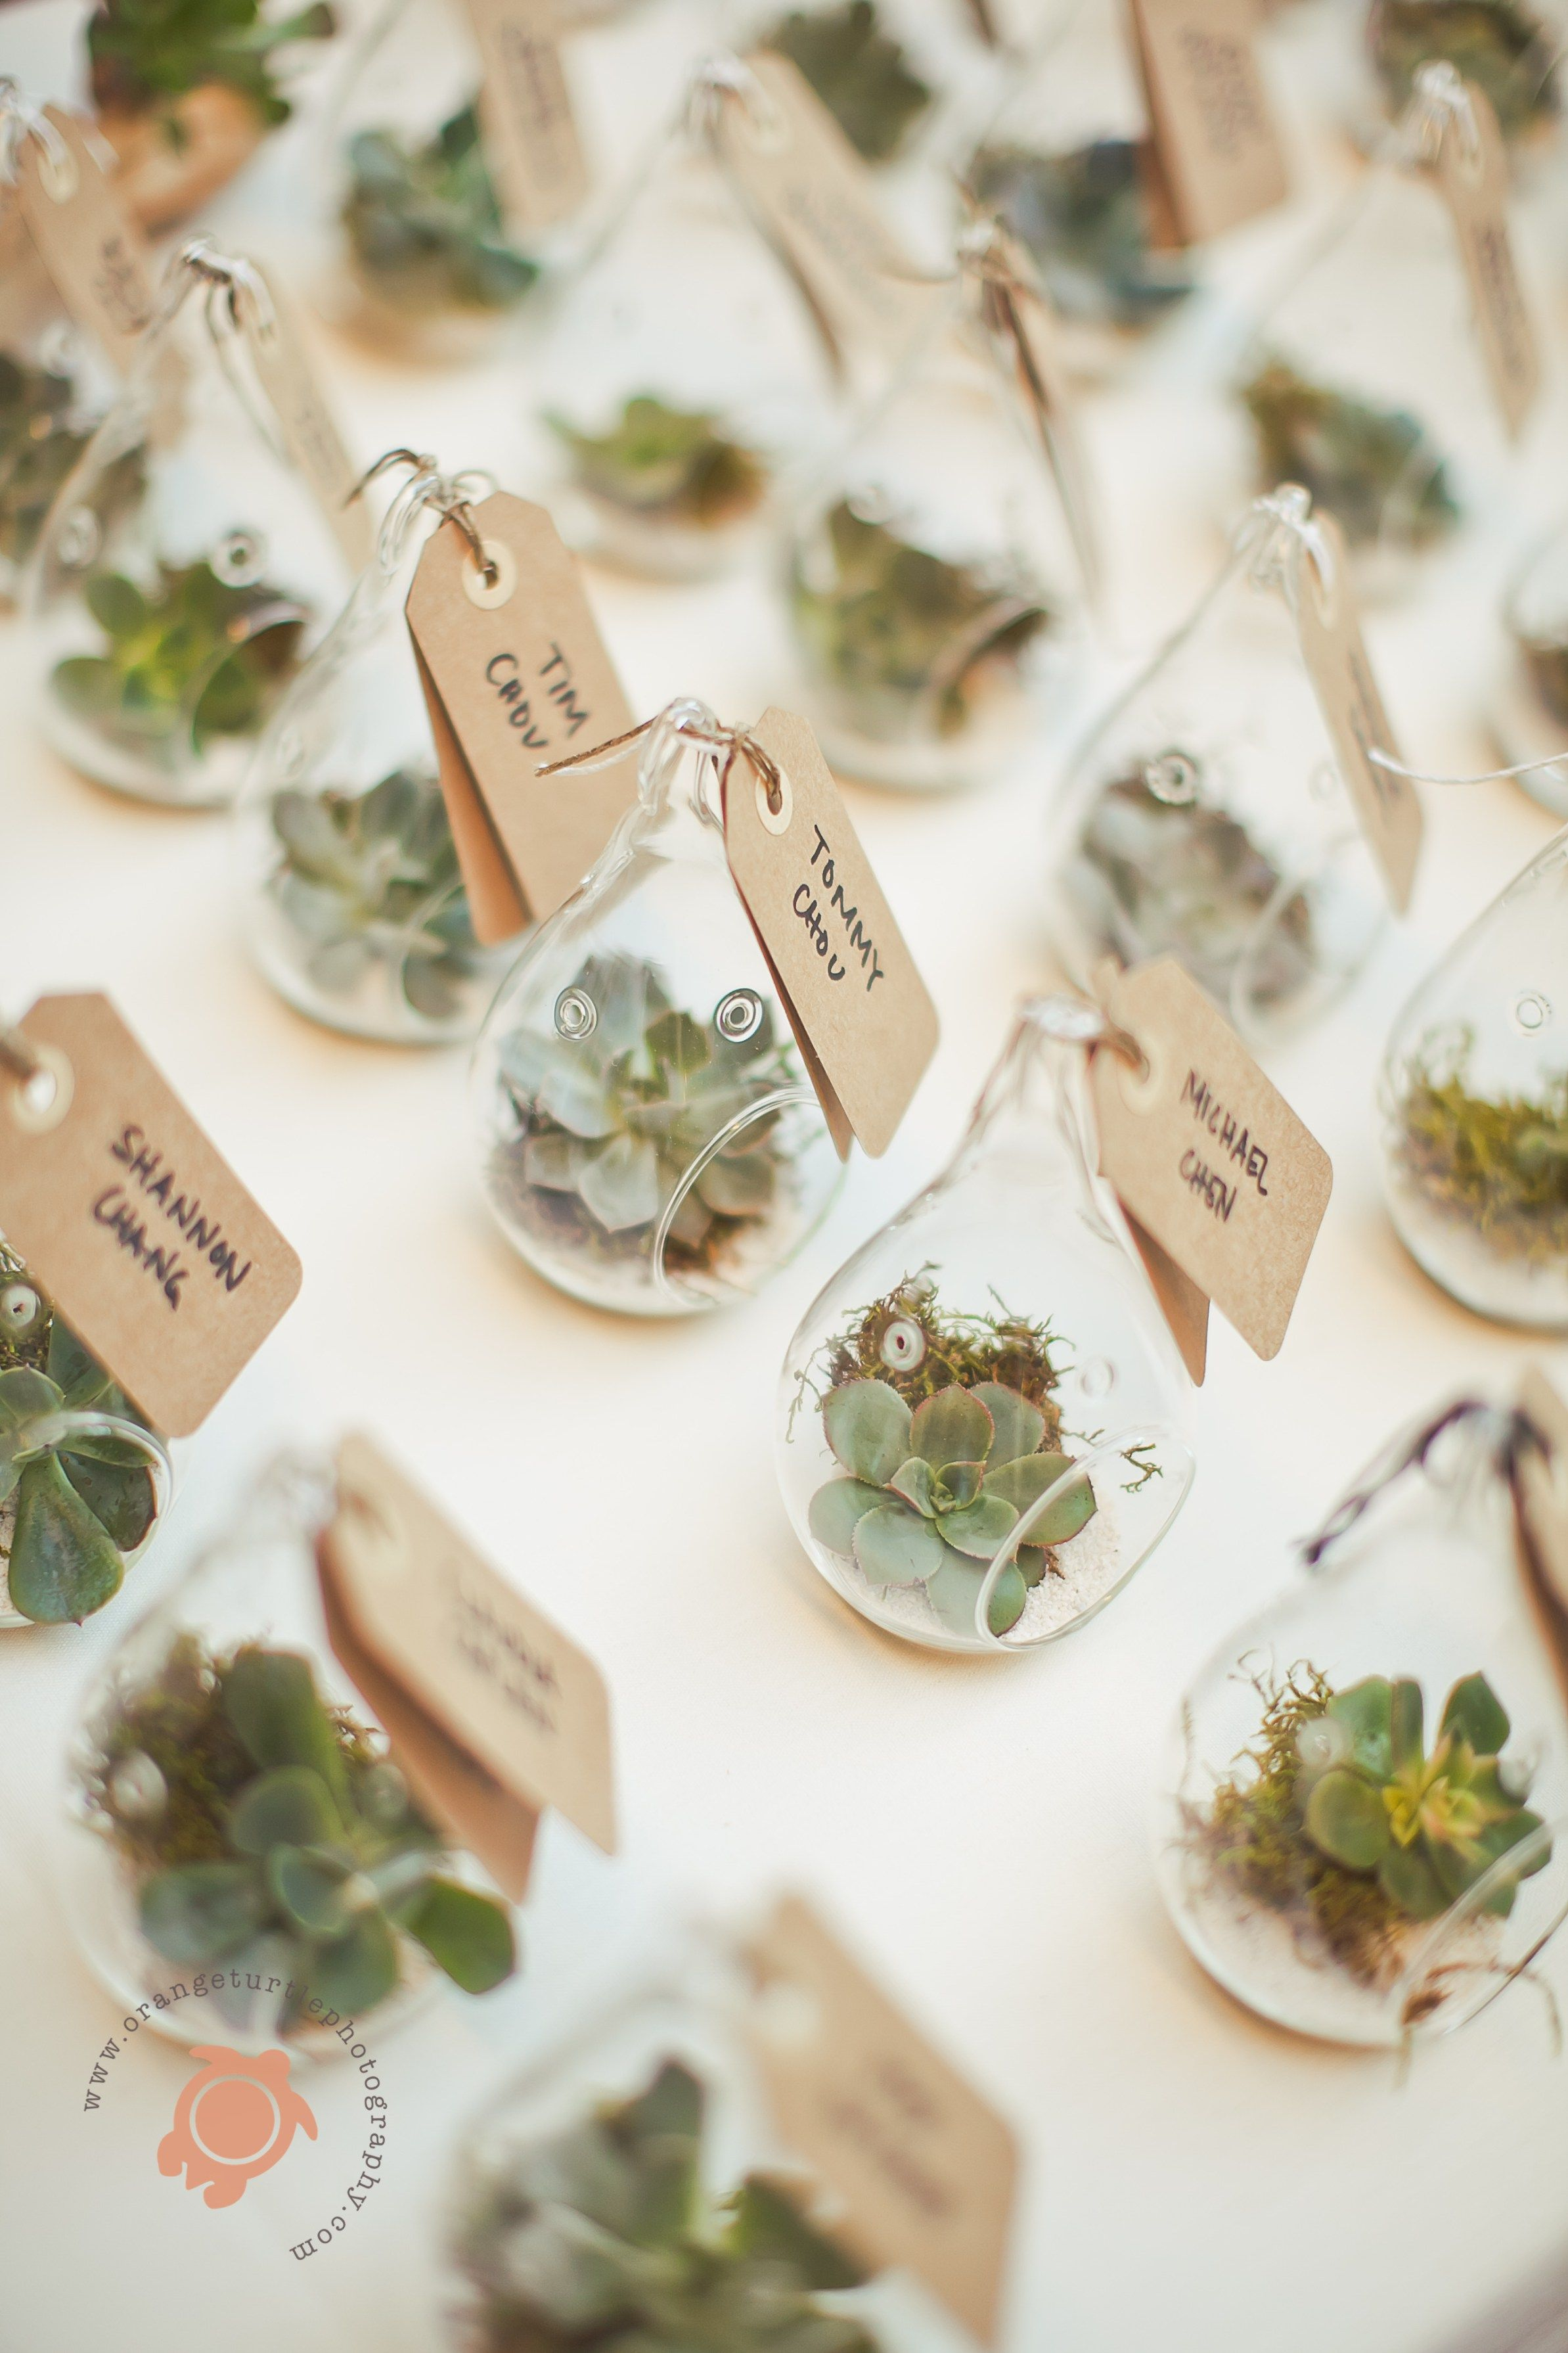 Pin by Nikkol Zezza on Wedding | Pinterest | Wedding